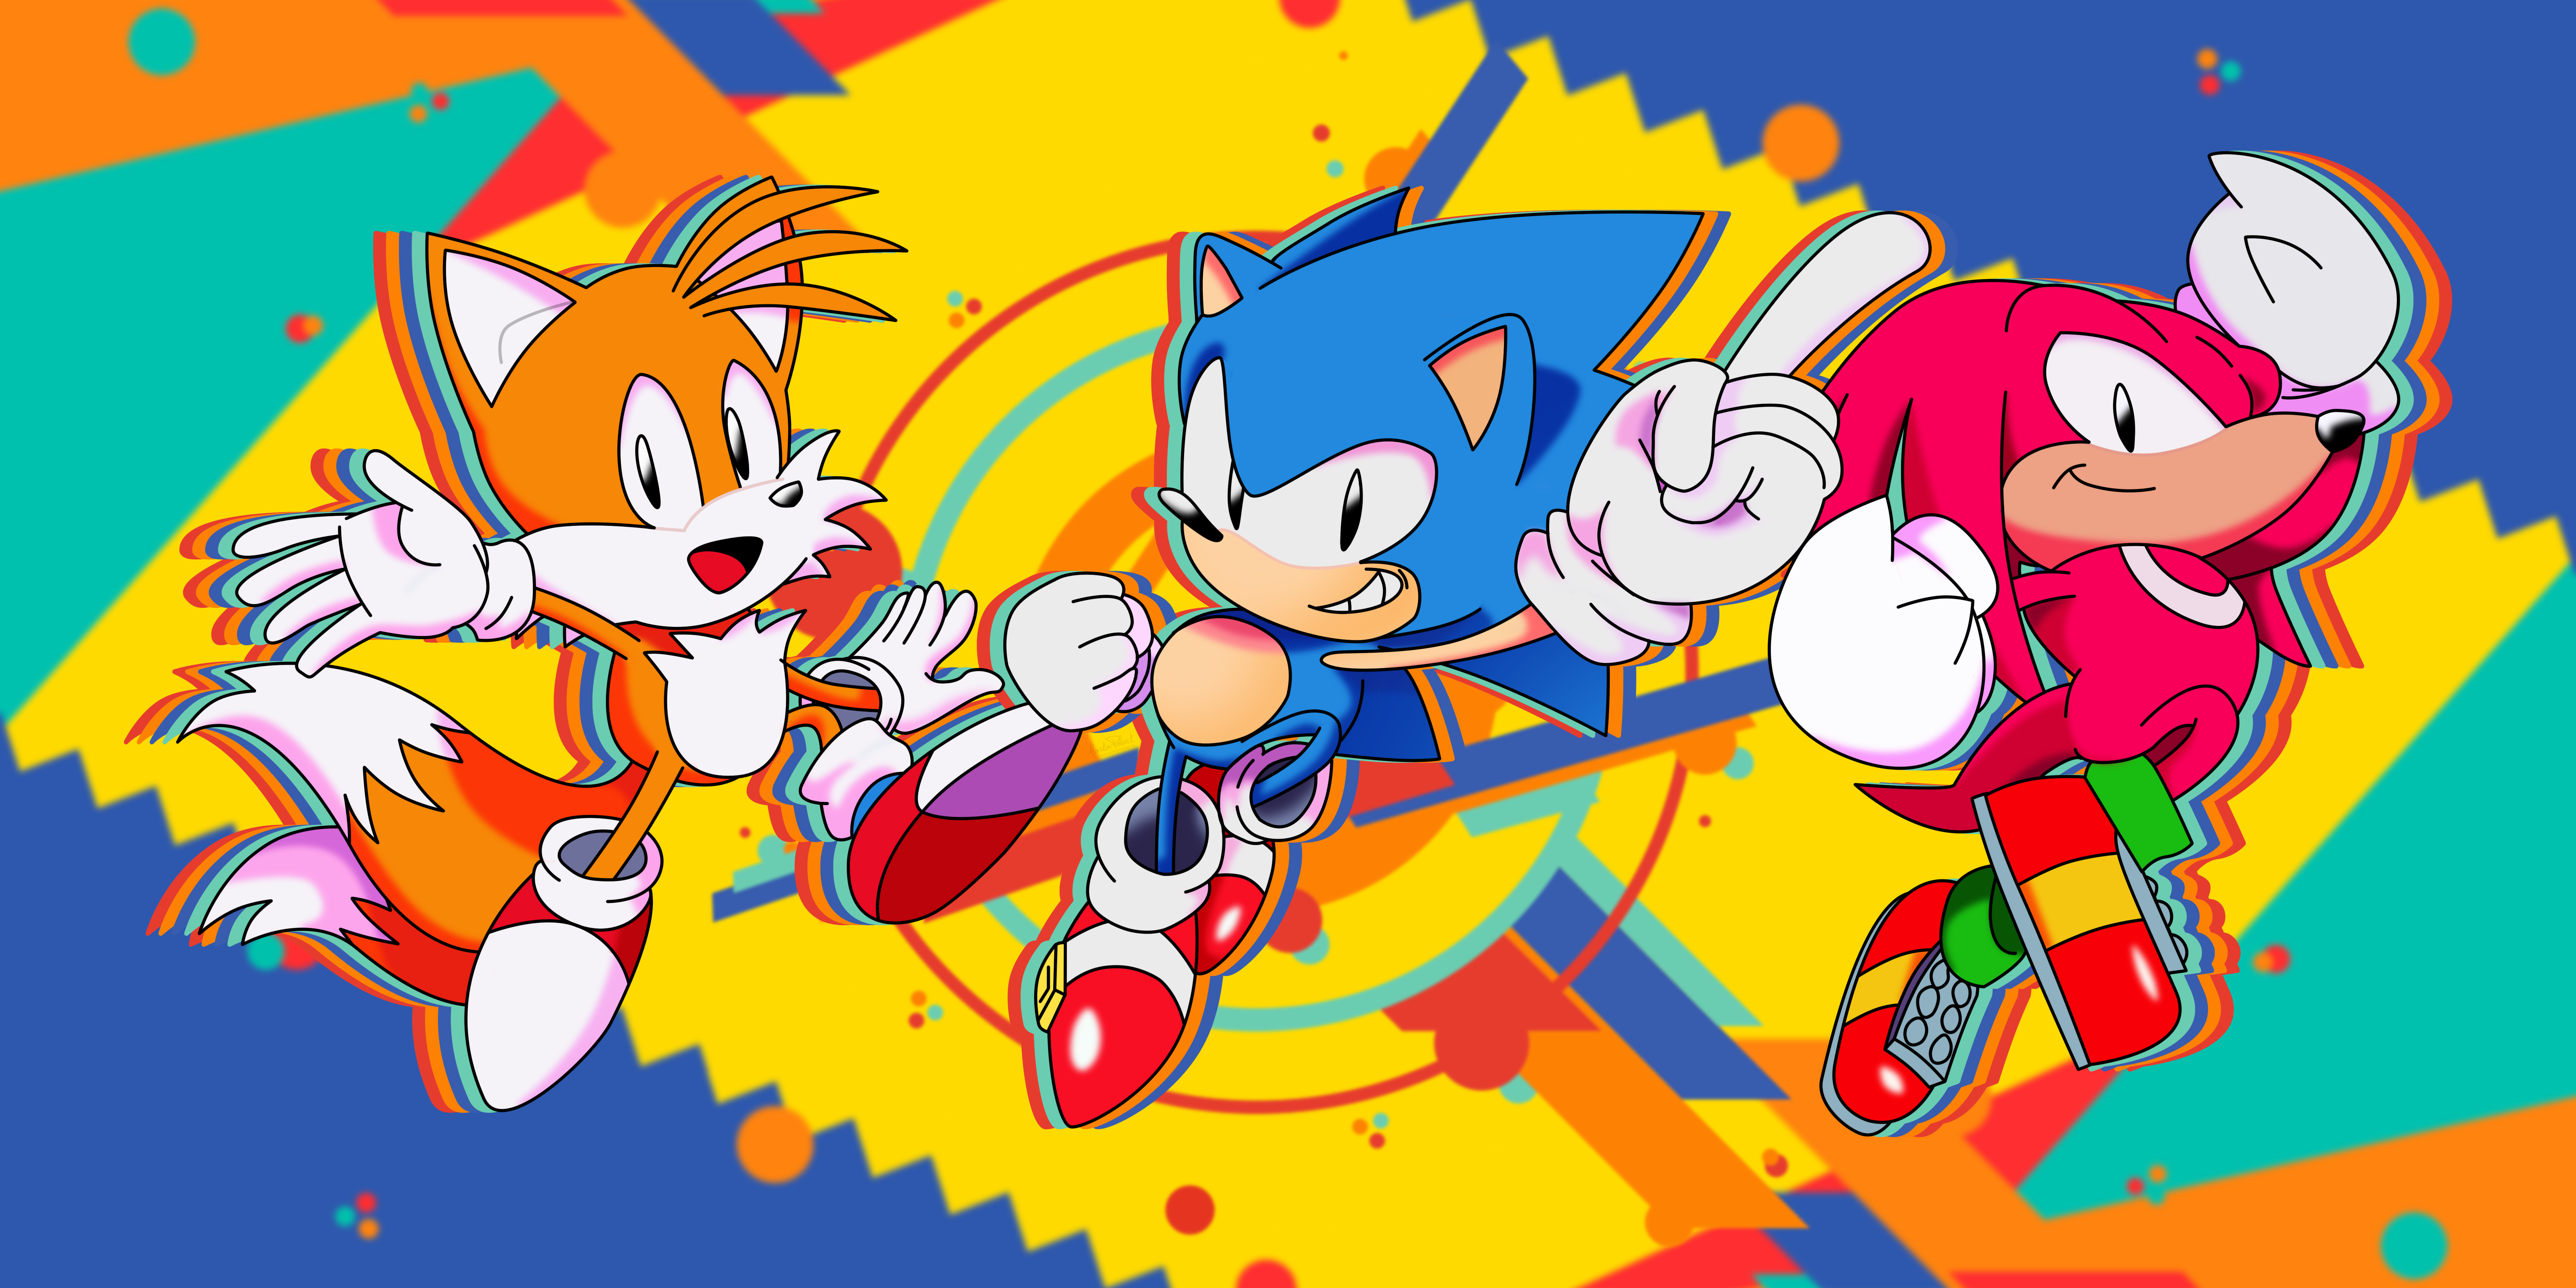 Sonic Mania - Triple Trouble [4K] by Alaska-Pollock on ...